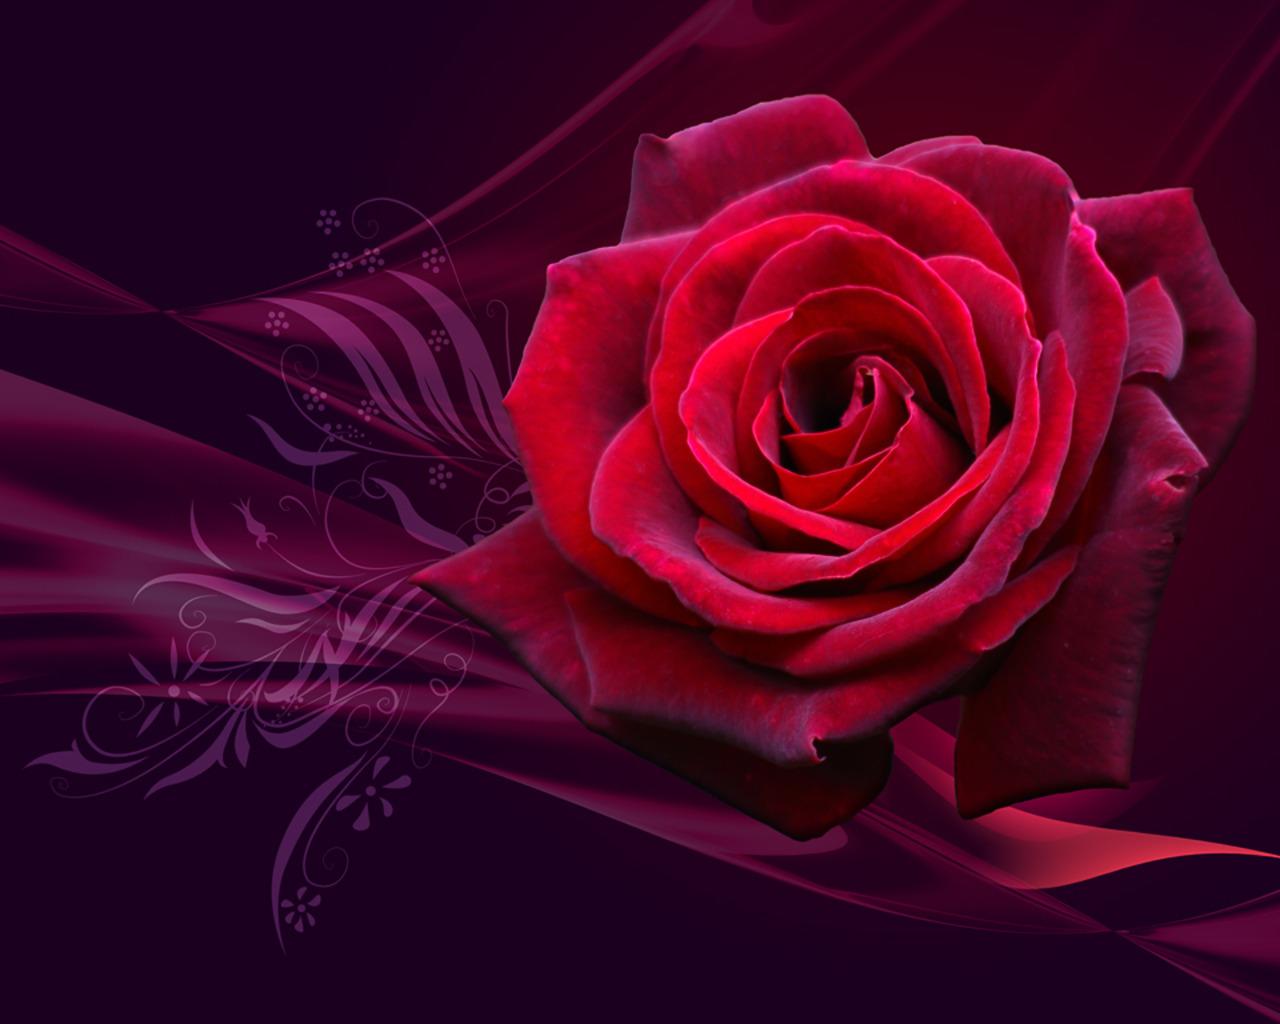 http://3.bp.blogspot.com/-Y899R4ZdiPE/T4LticyIi0I/AAAAAAAACx0/WqHnqSmGDWM/s1600/2011-red-rose-valentine-day-wallpaper.jpg